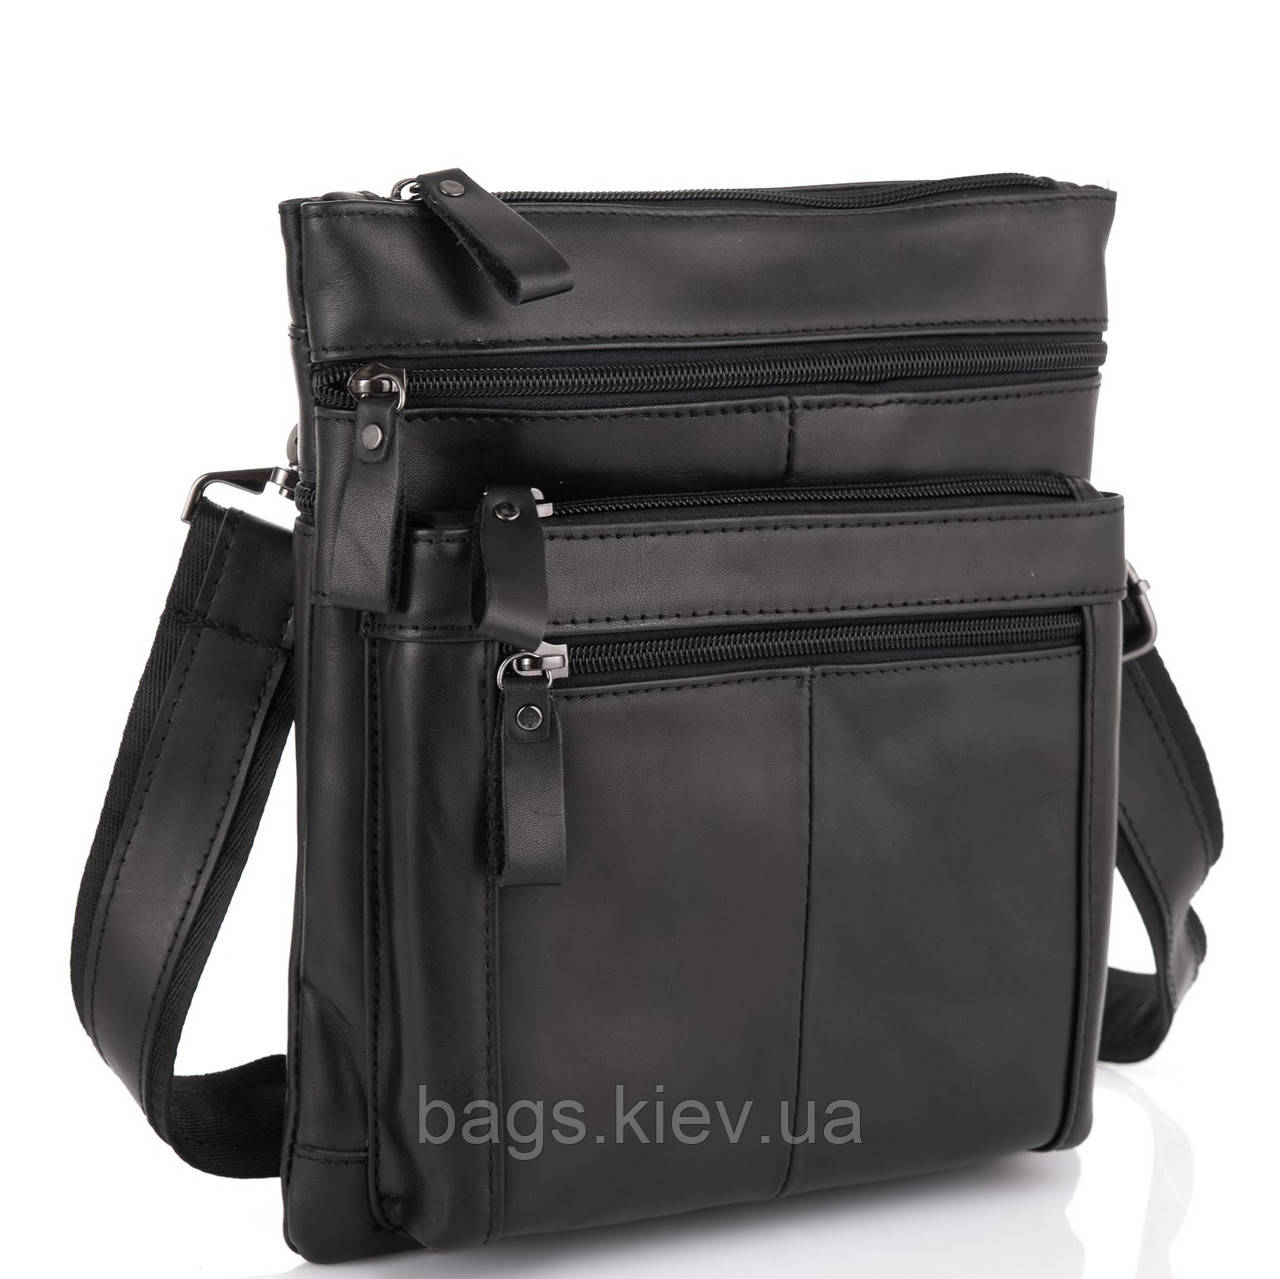 Черная мужская кожаная сумка через плечо Tiding Bag N2-8011A